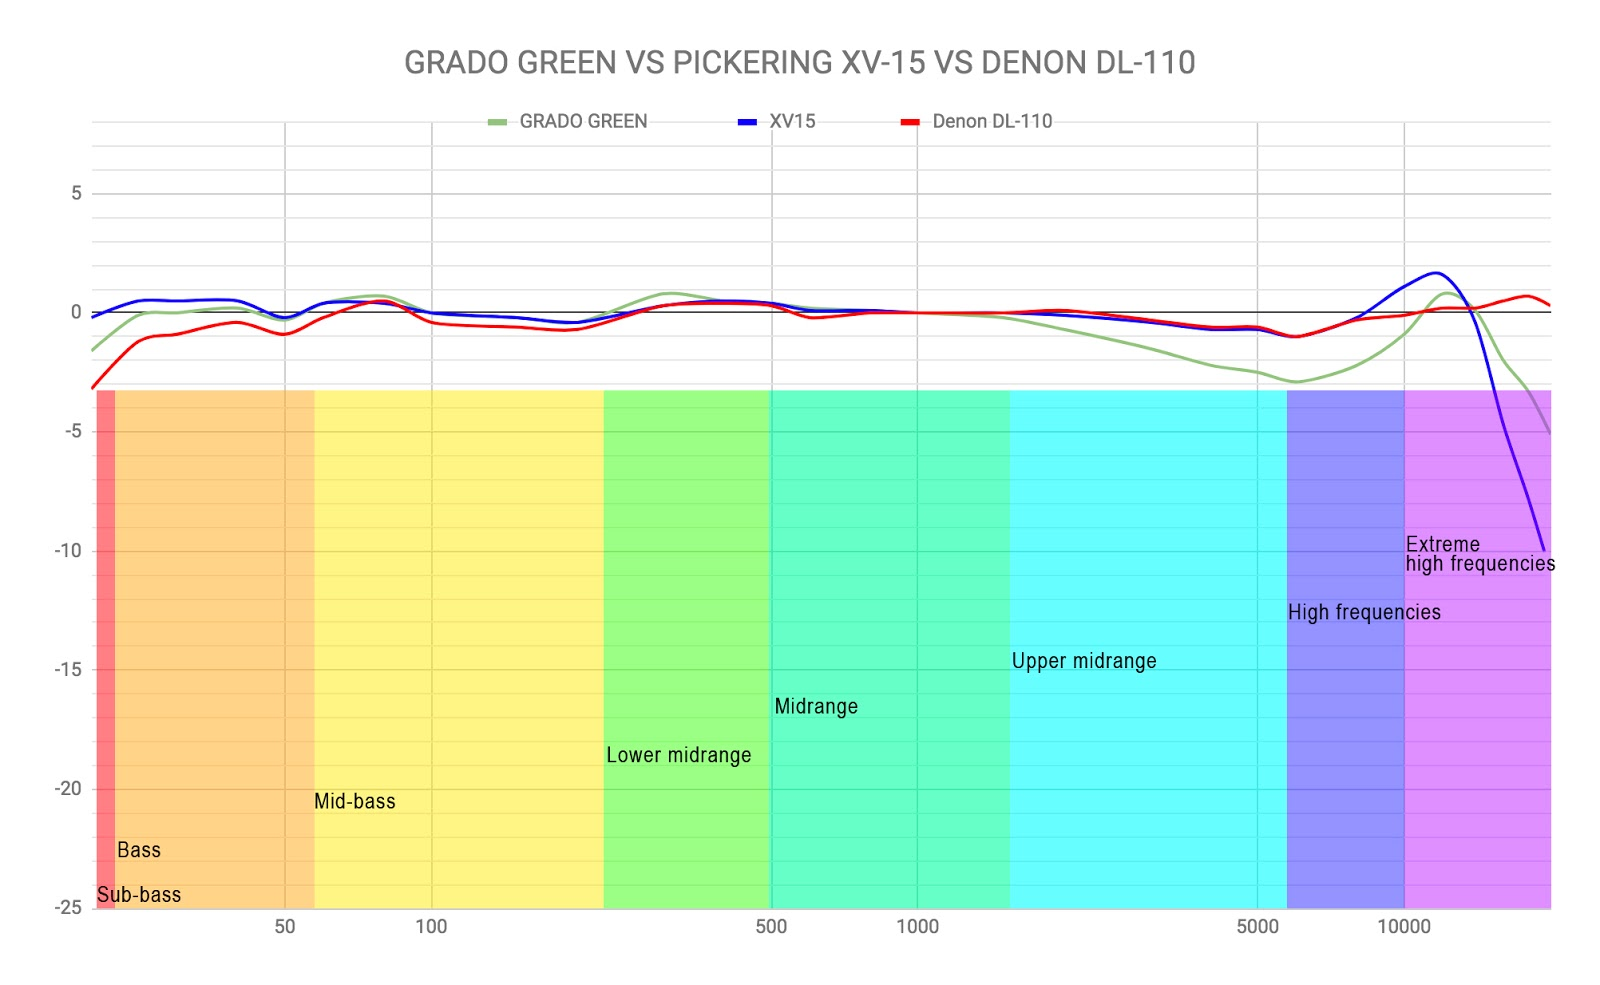 Grado Stylus Chart Gold Wiring Diagram Flowering Toilet Phono Cartridge Comparison Green 1600x985